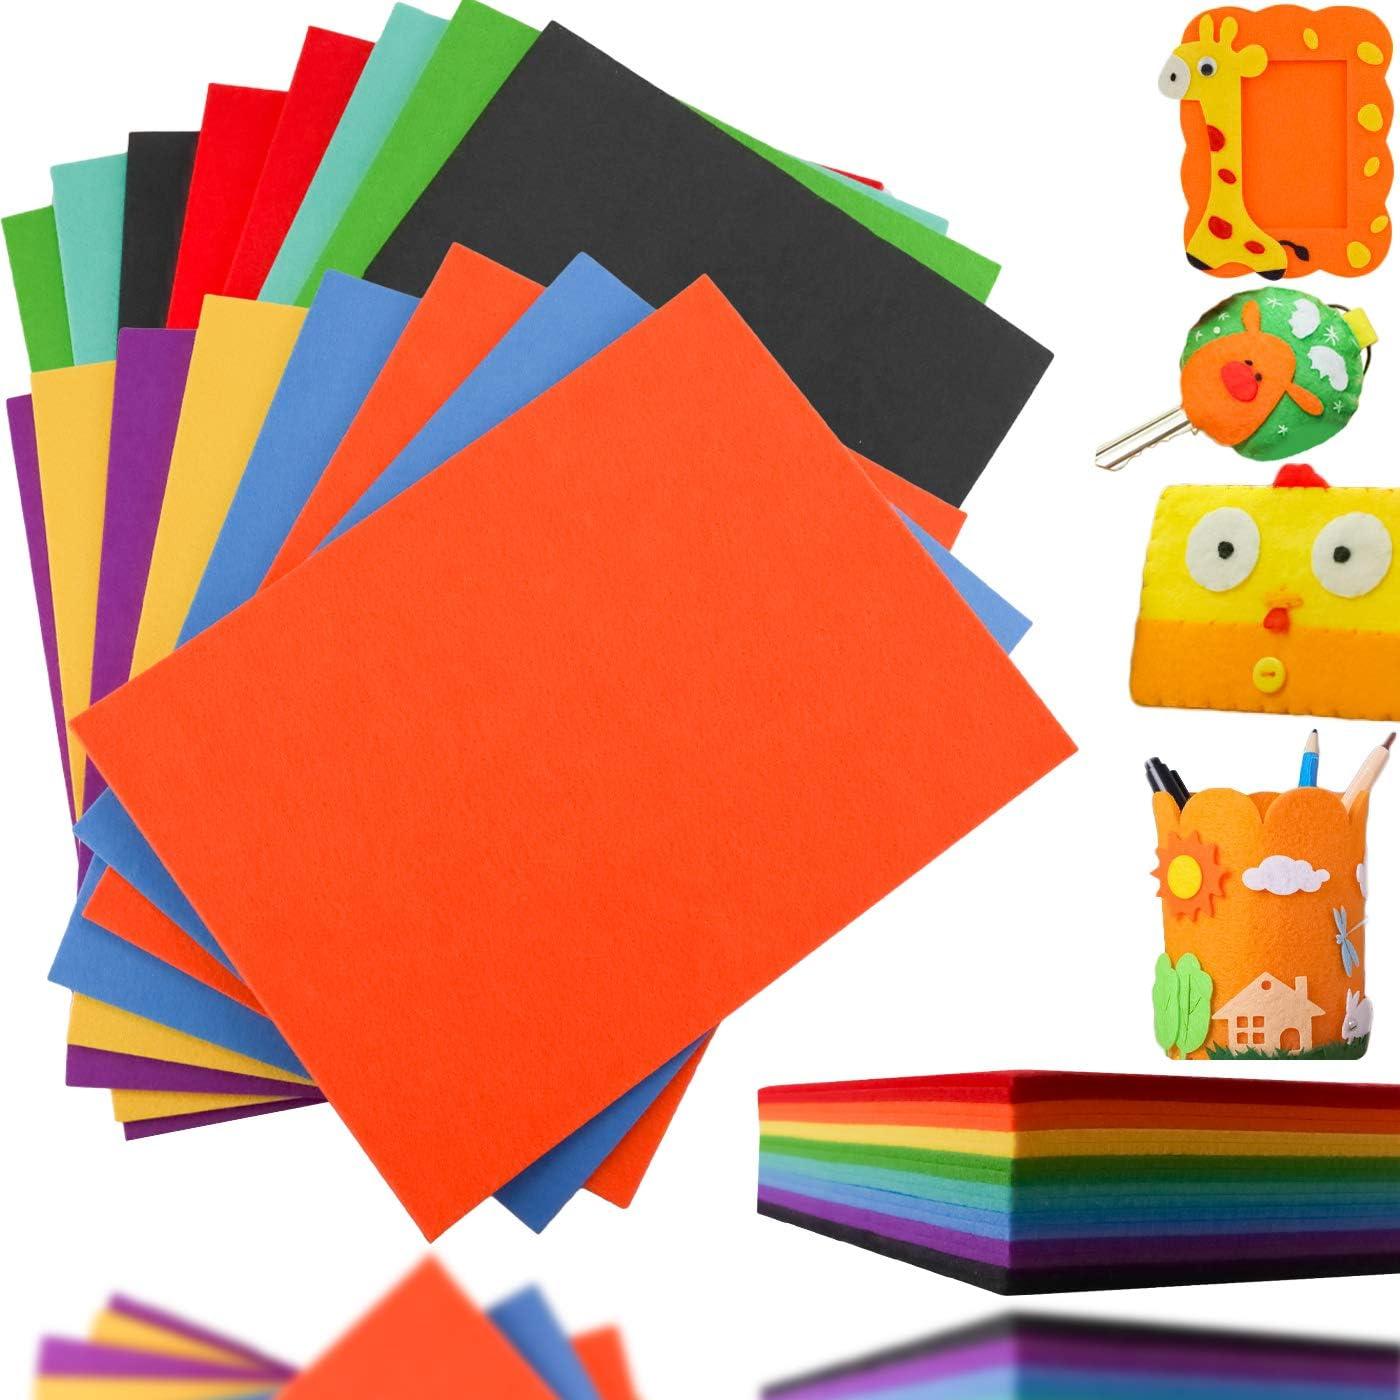 Max 61% OFF LeonBach Fees free 16 Pcs 3mm Thick Felt Craft Different Colors 8 Sheets